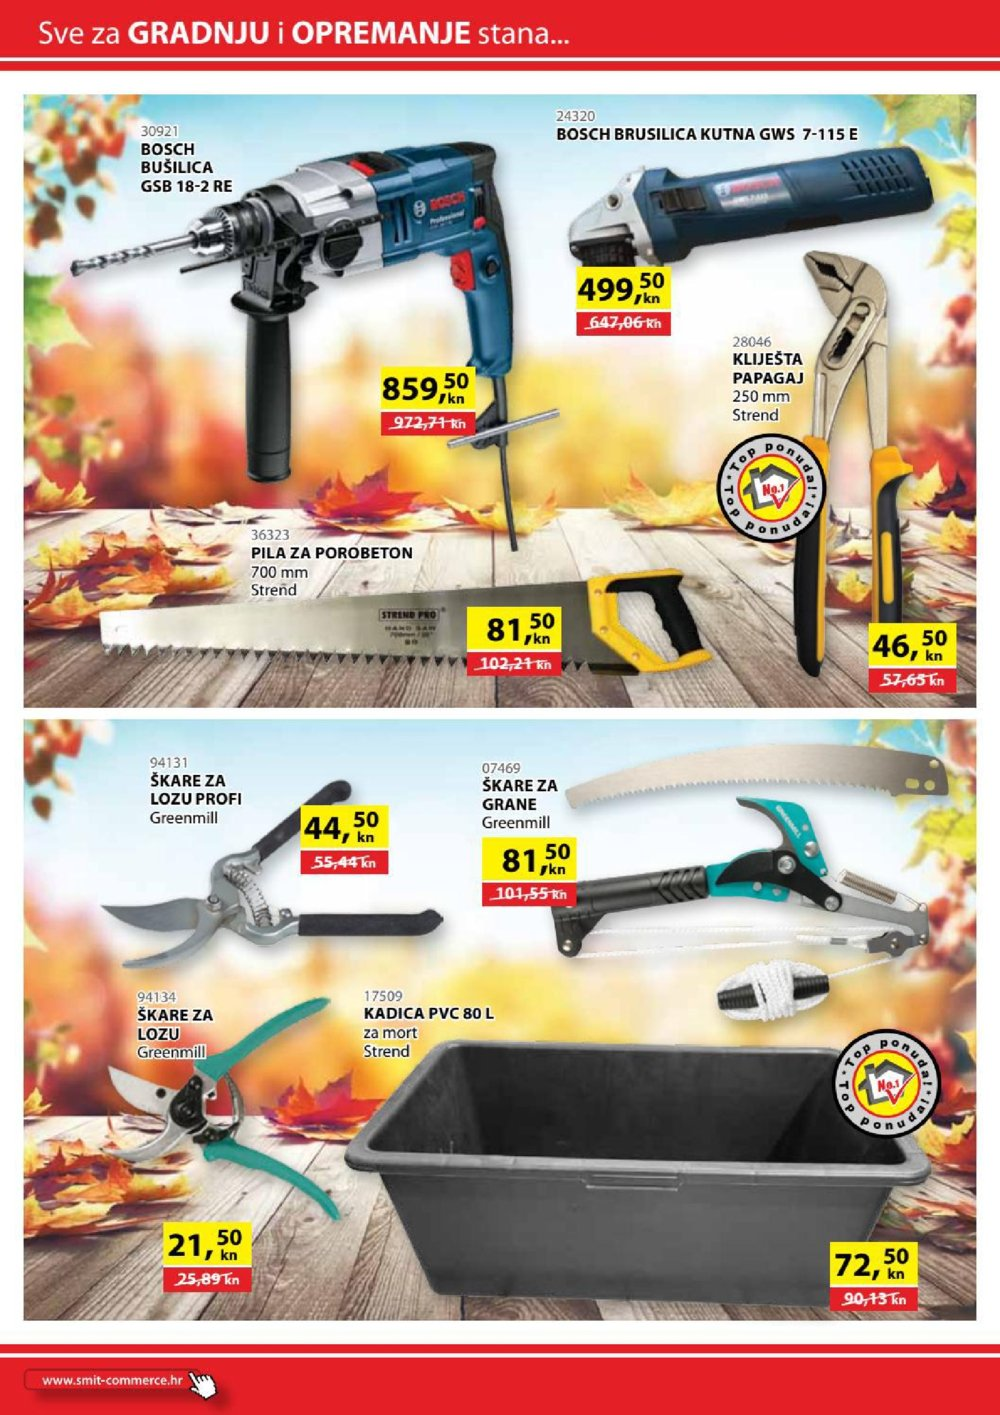 Smit Commerce Katalog Akcija 15.09.-14.10.2021.